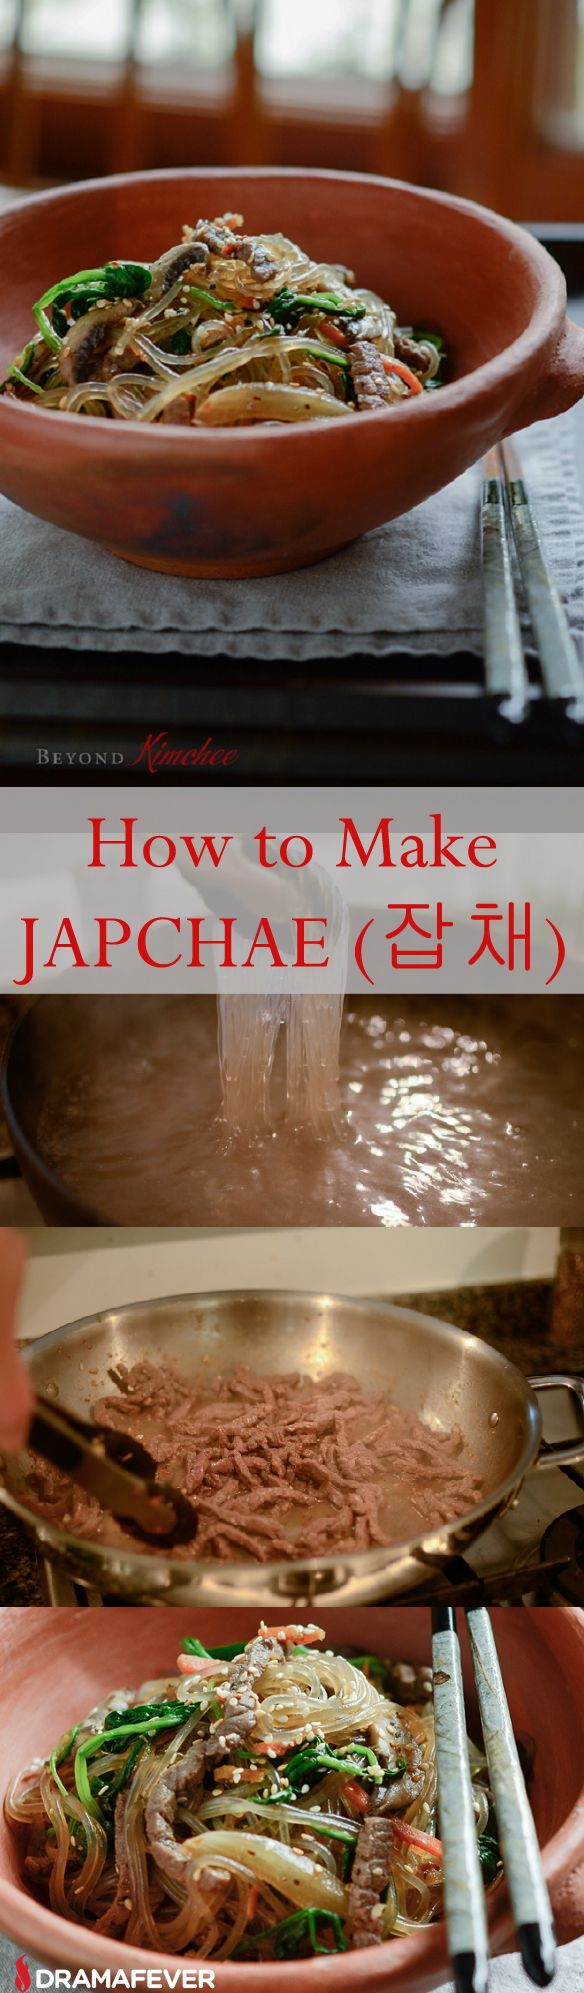 Learn an easy recipe for japchae, (잡채) a Korean noodle dish!